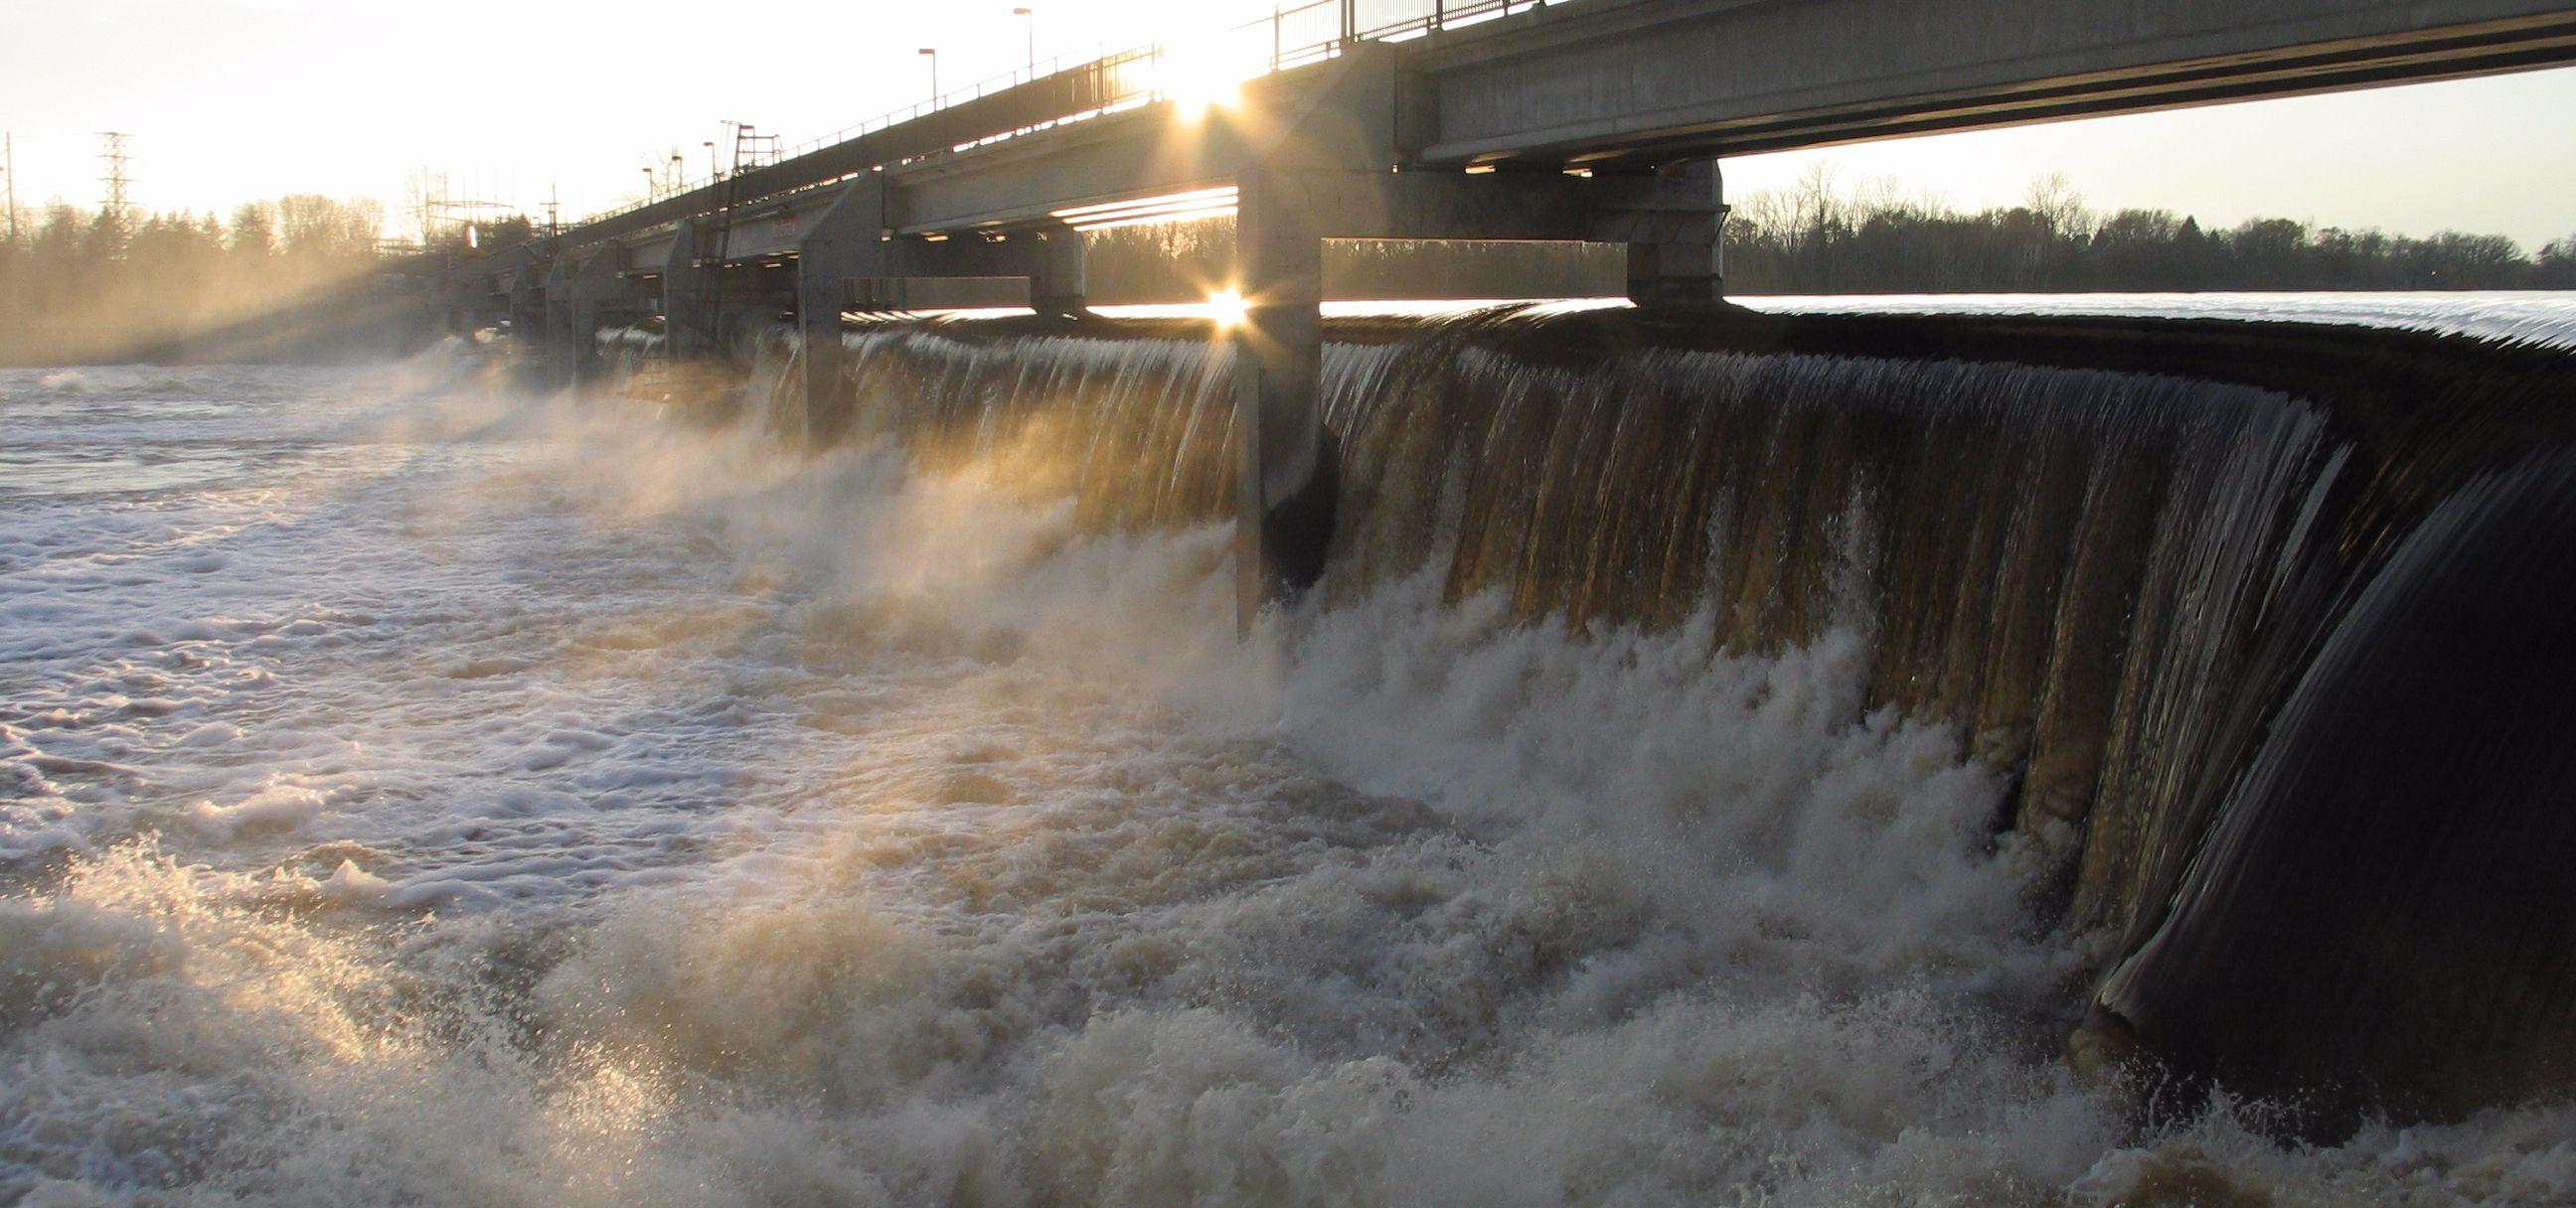 Anoka County Parks - Coon Rapids Dam